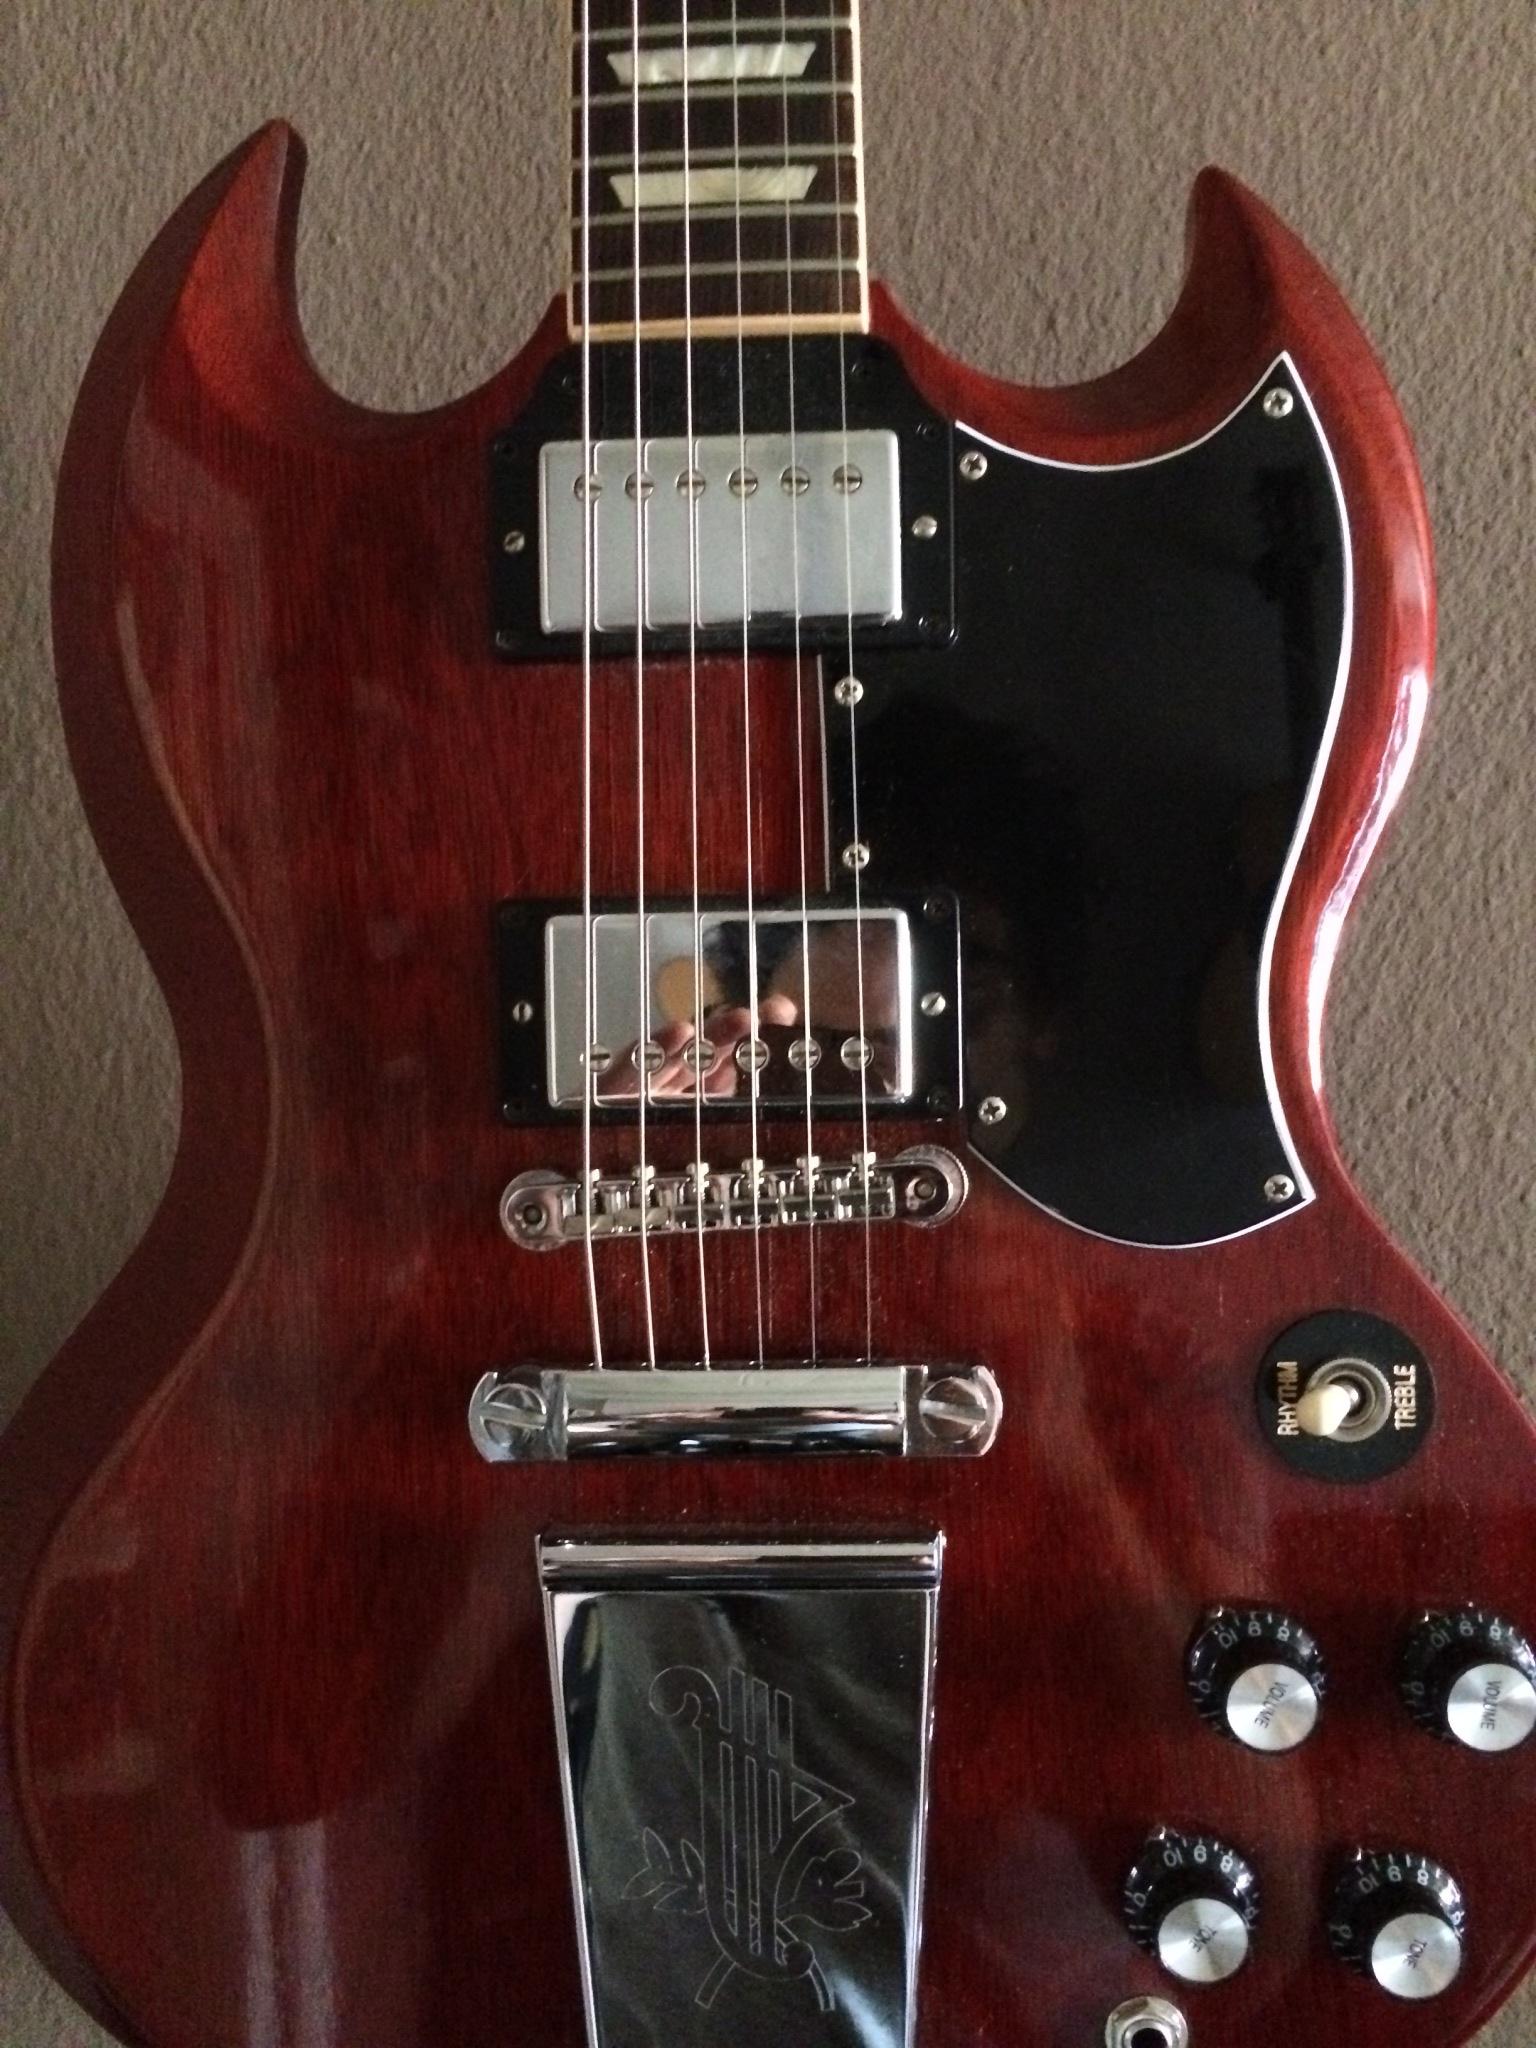 gibson sg derek trucks 2012 heritage cherry guitar for sale the wooden. Black Bedroom Furniture Sets. Home Design Ideas